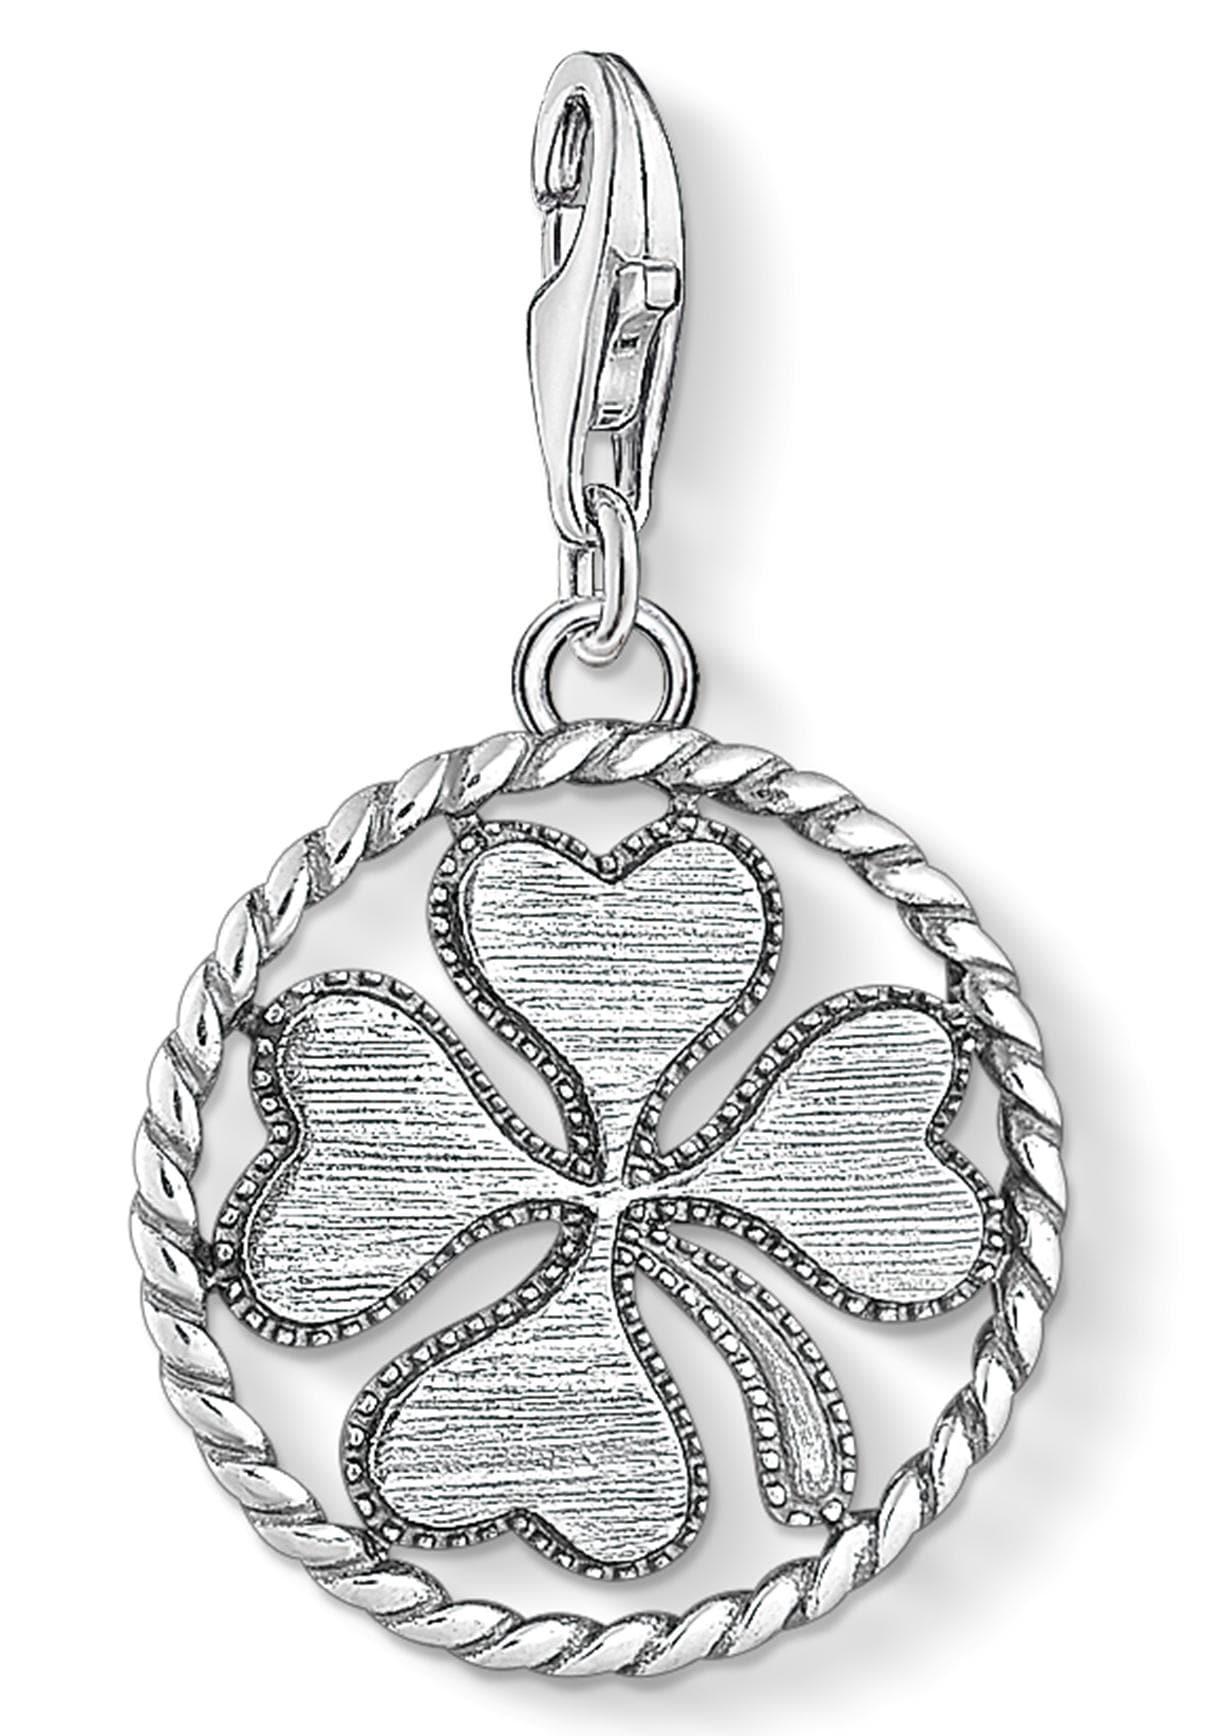 THOMAS SABO Charm-Einhänger Coin Kleeblatt 1759-637-21 | Schmuck > Charms > Charms Anhänger | Thomas Sabo